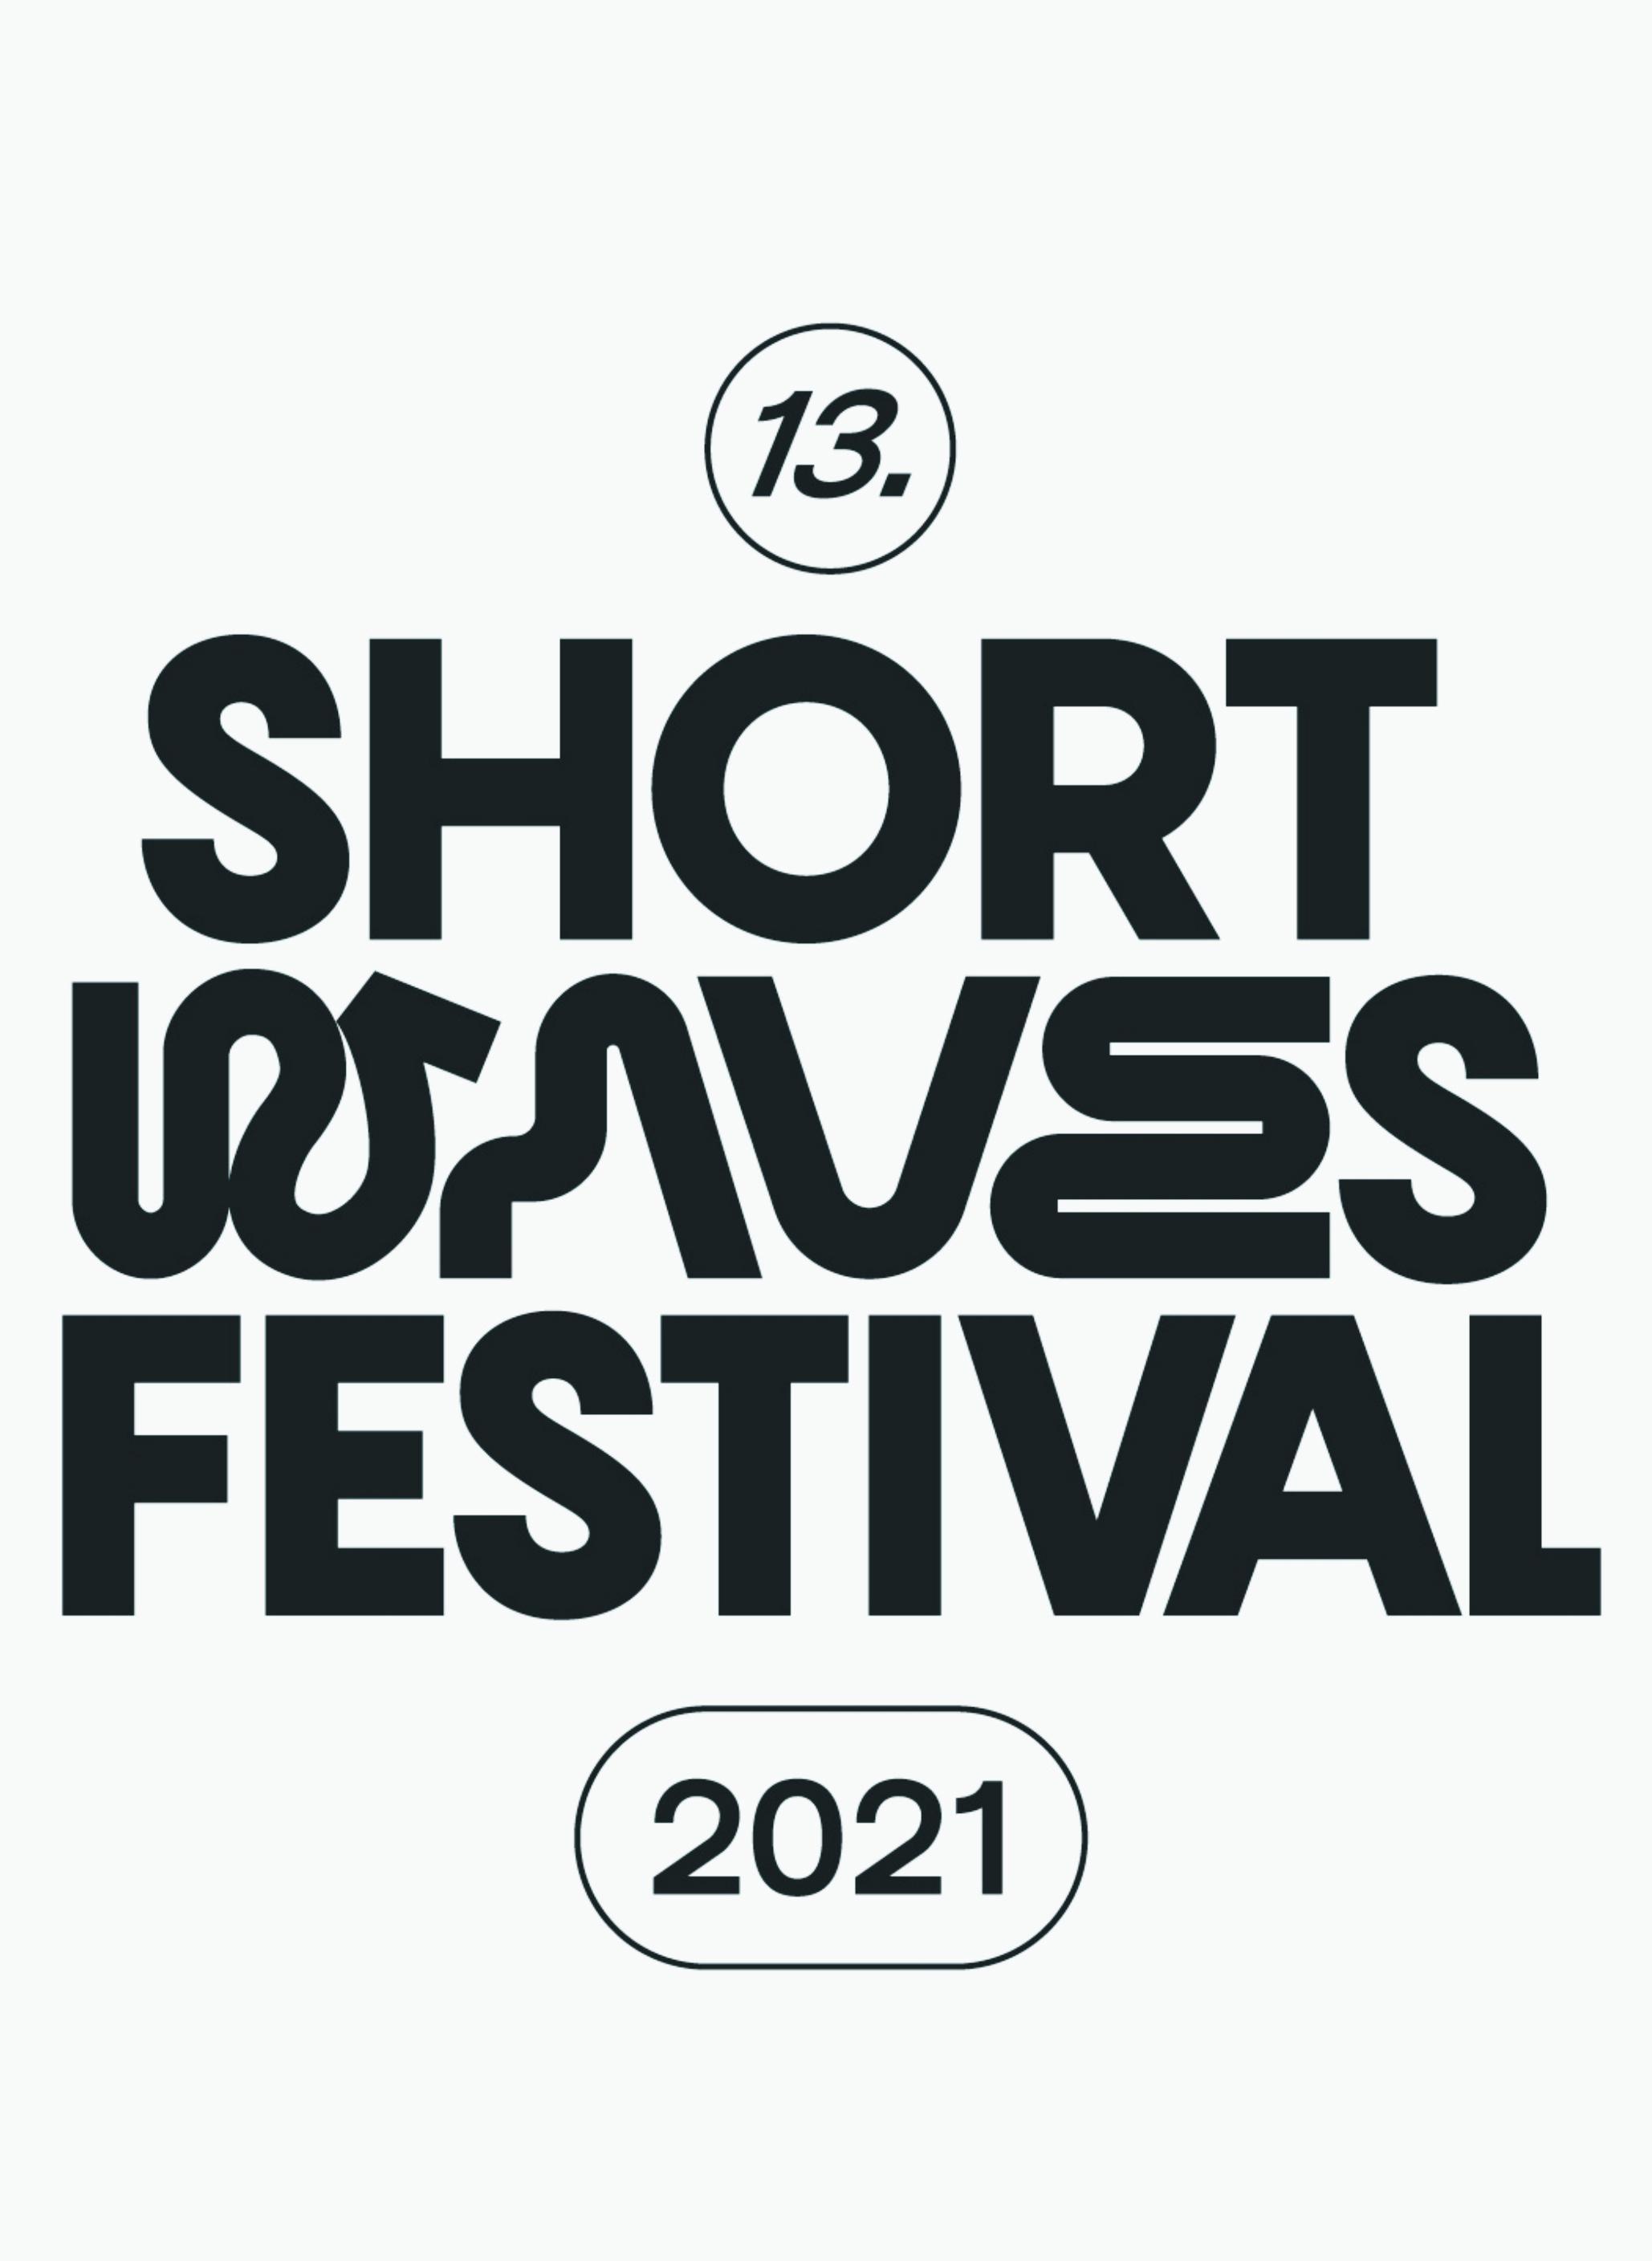 Short Waves Festiwal 2021 - Europejska Nagroda Filmowa